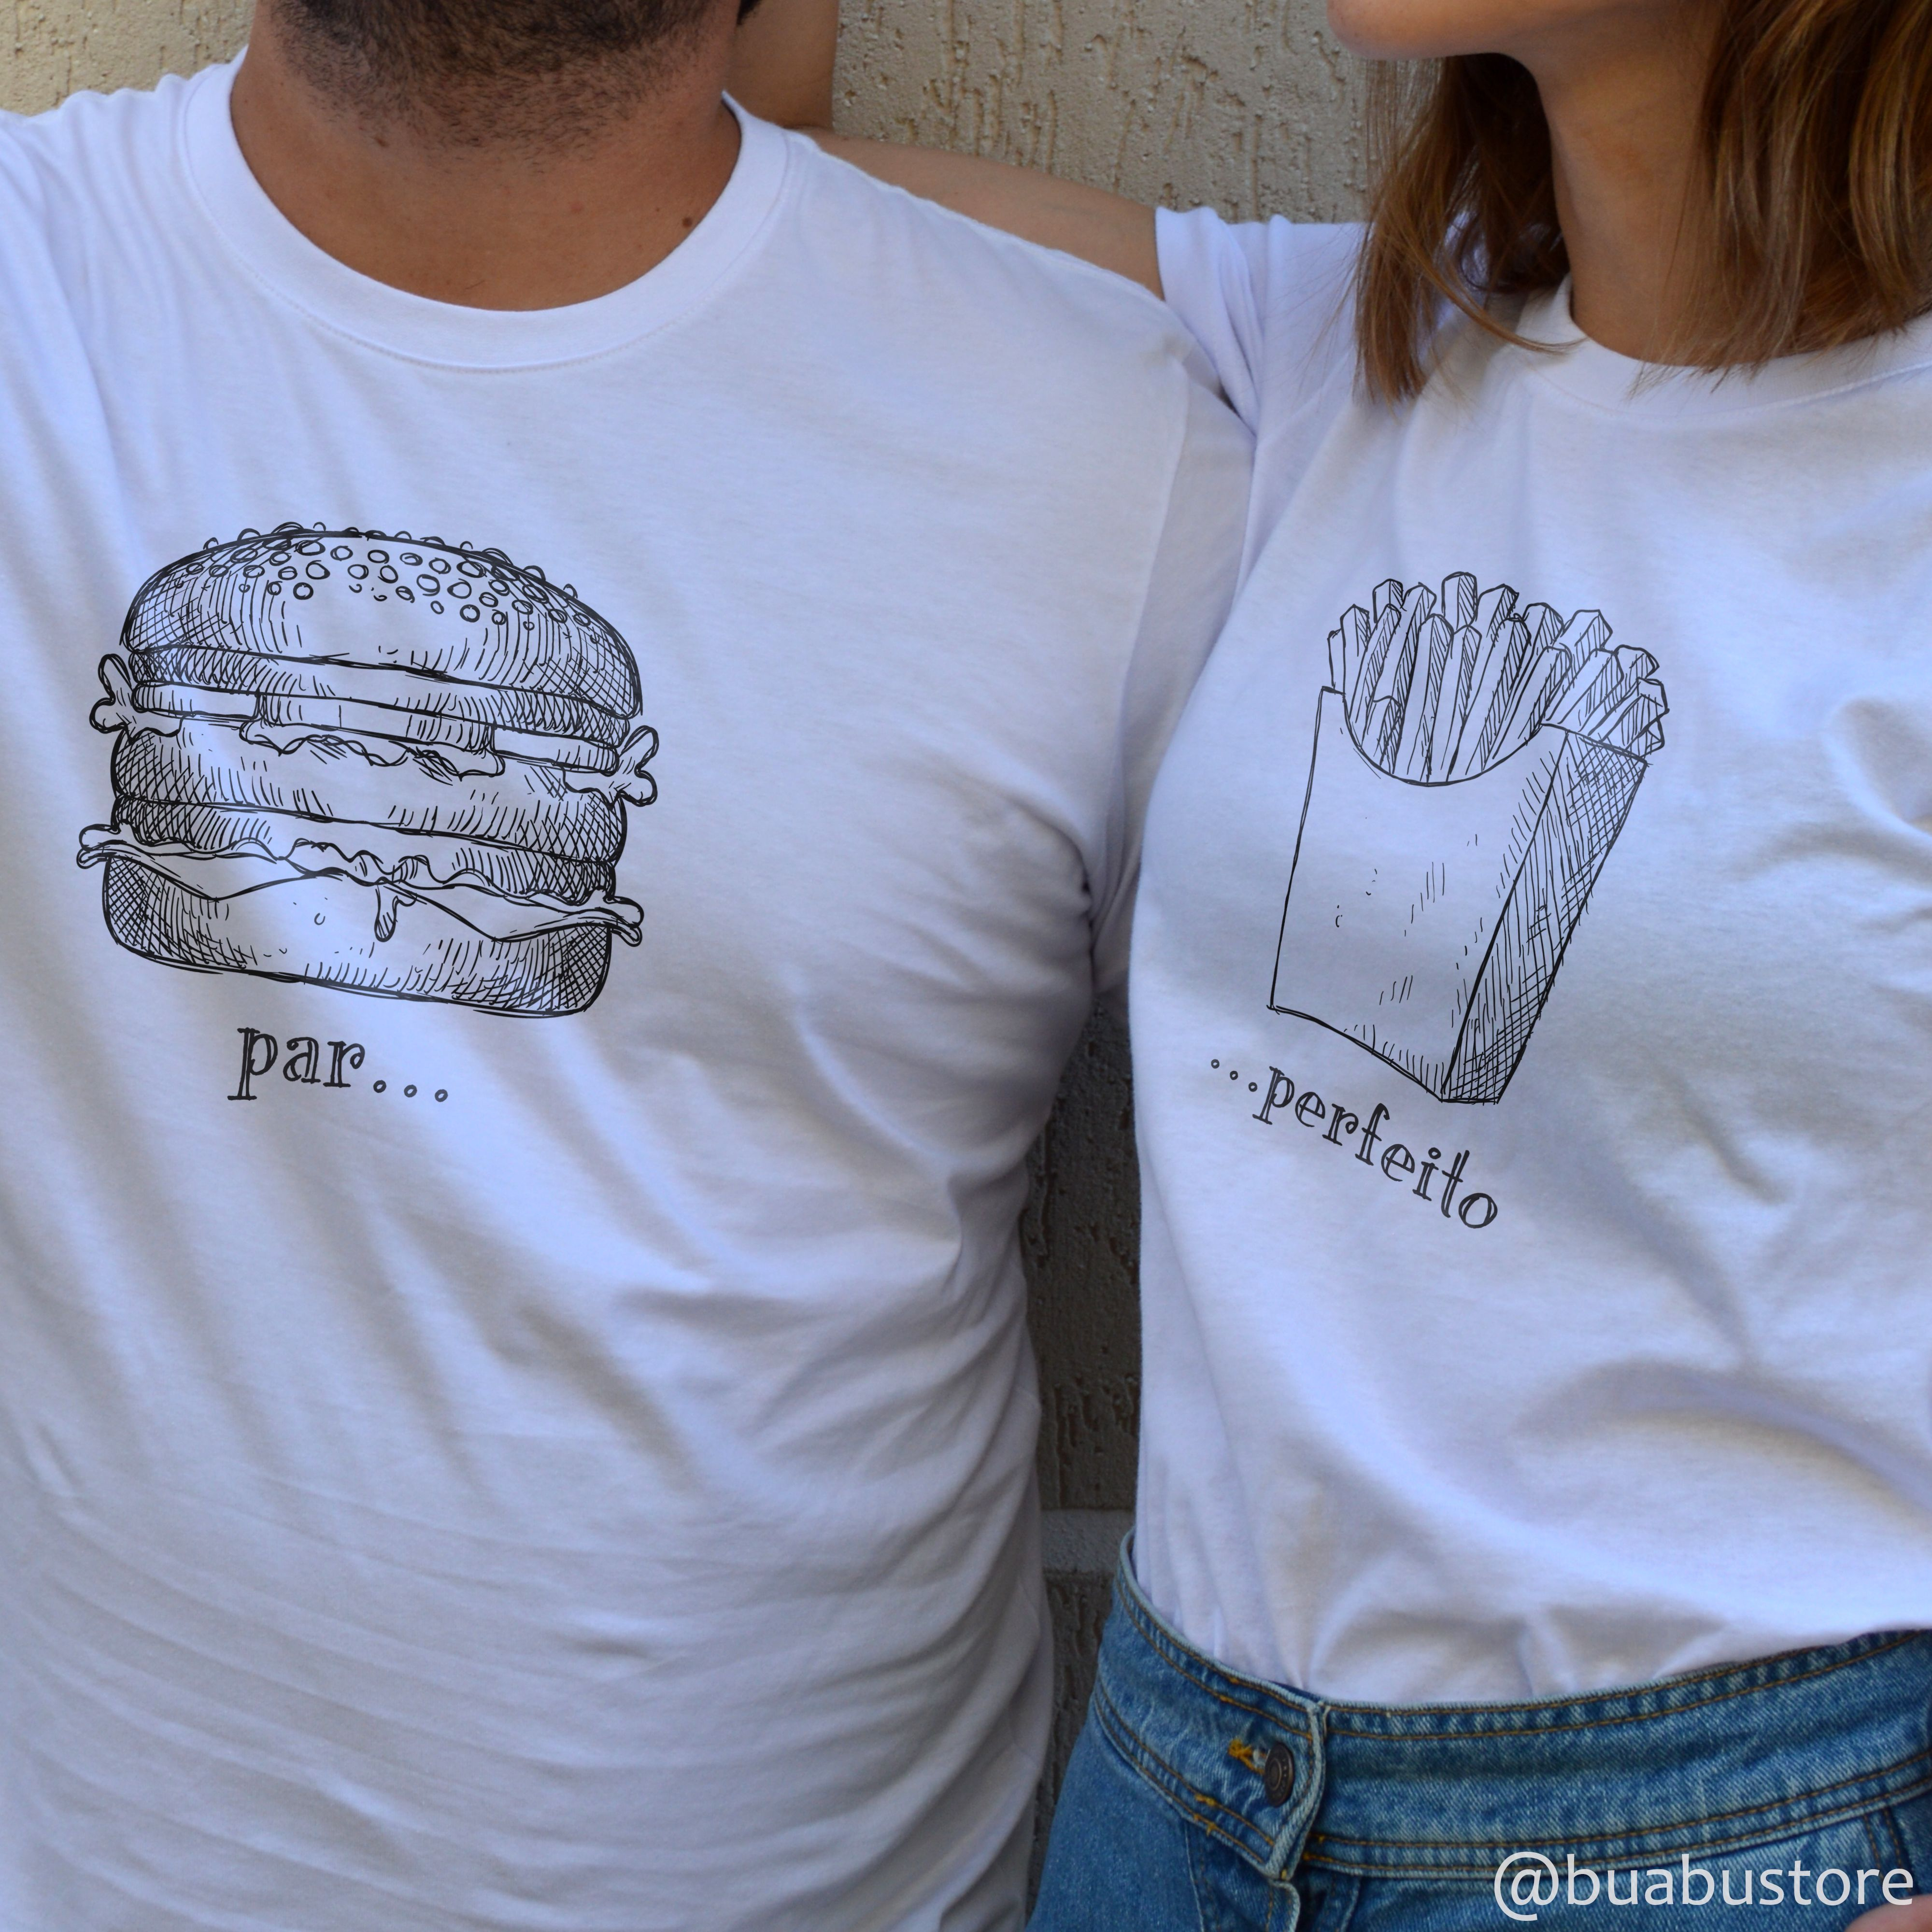 7a408f69472a8 Camiseta para casal